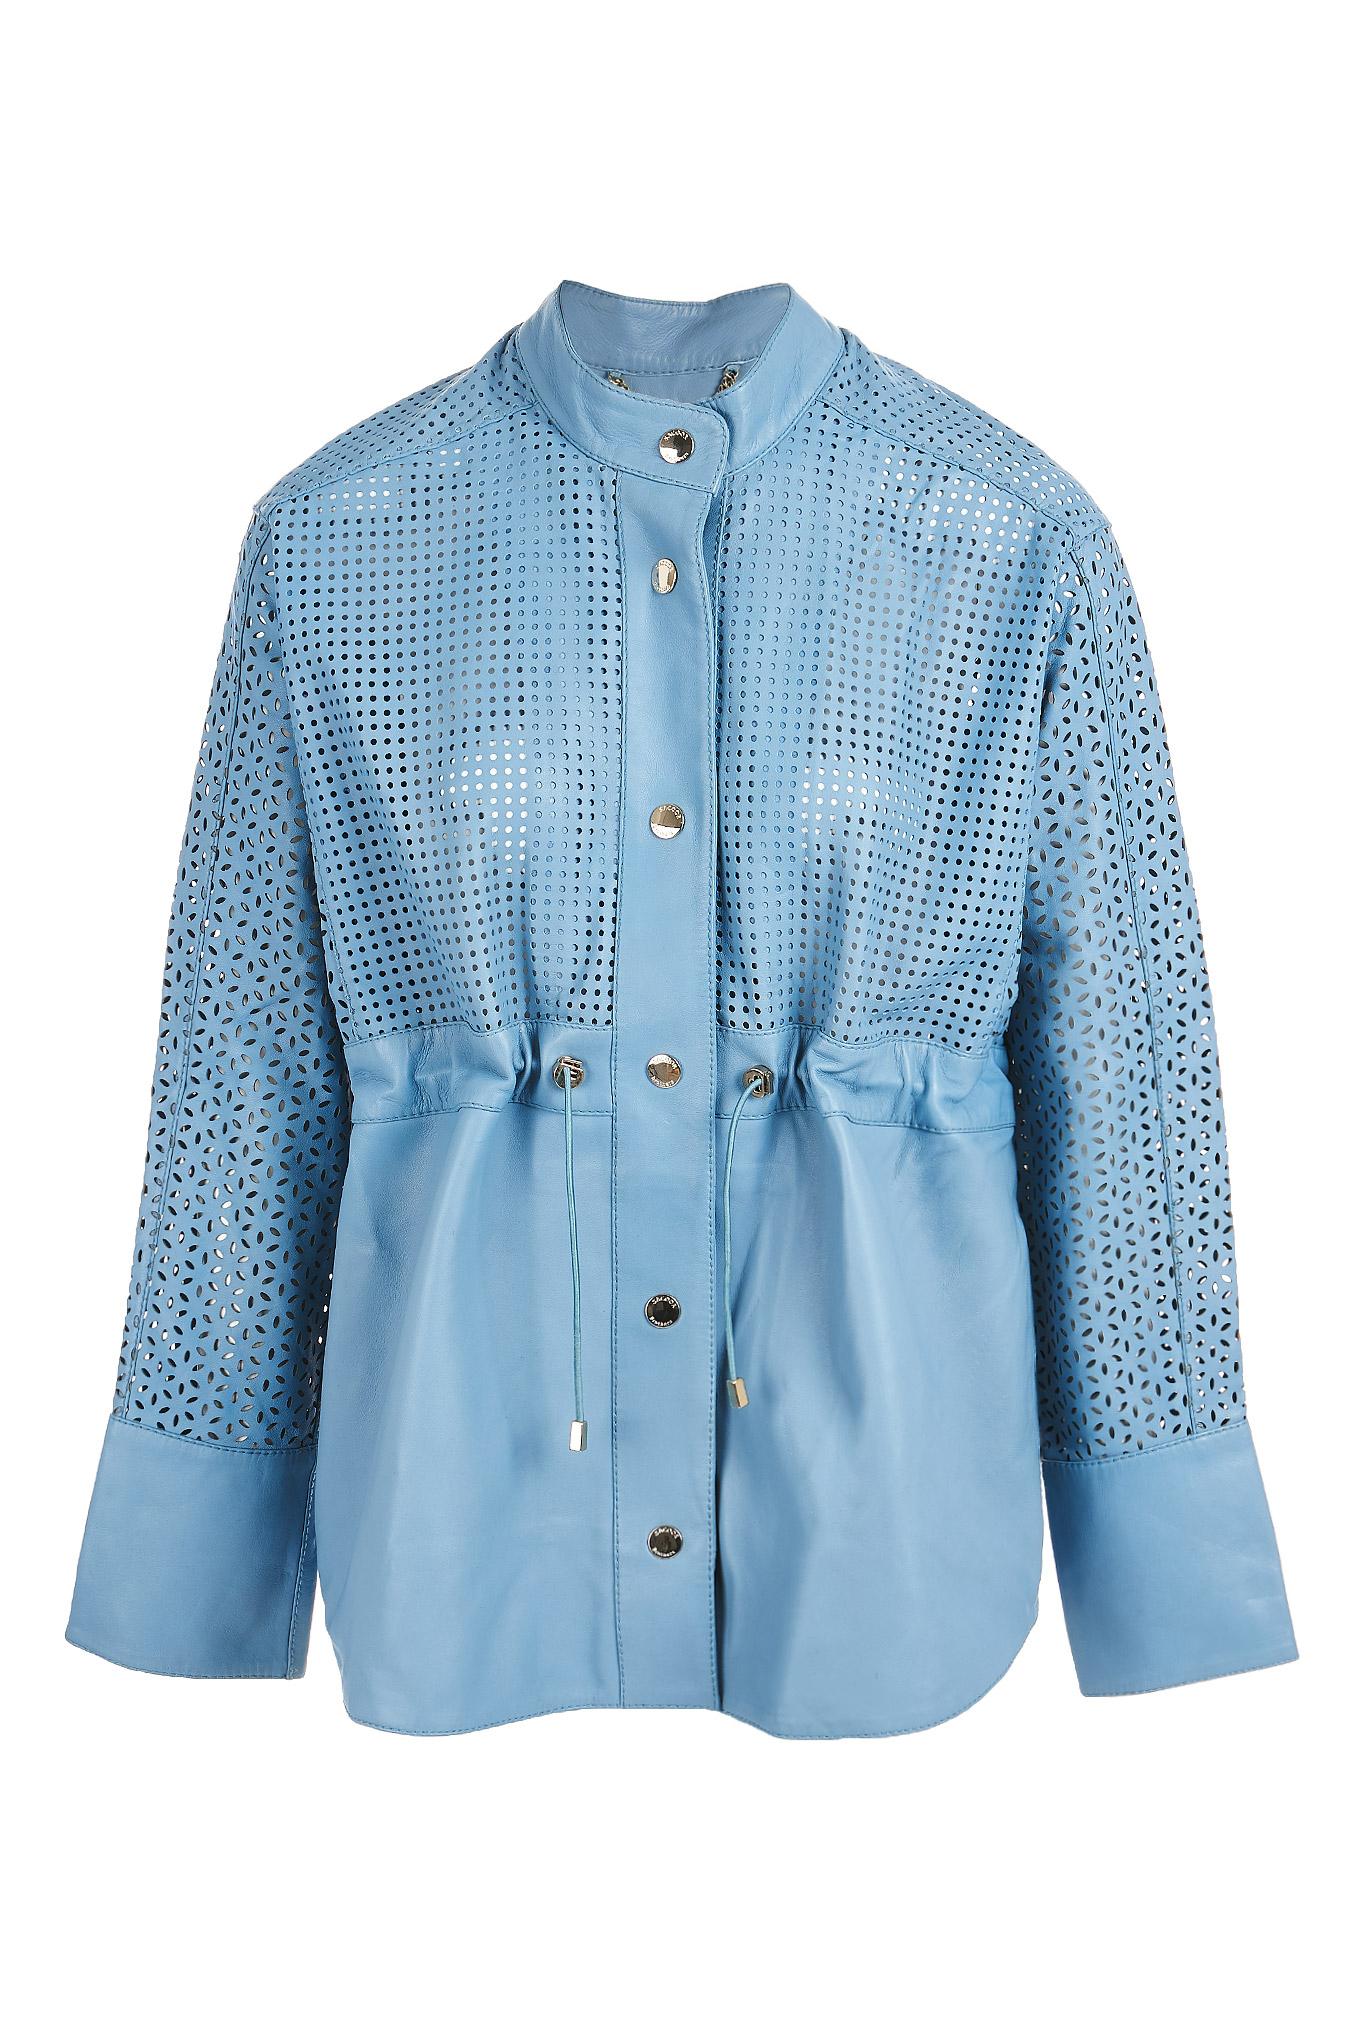 Leather Jacket Light Blue Sport Woman